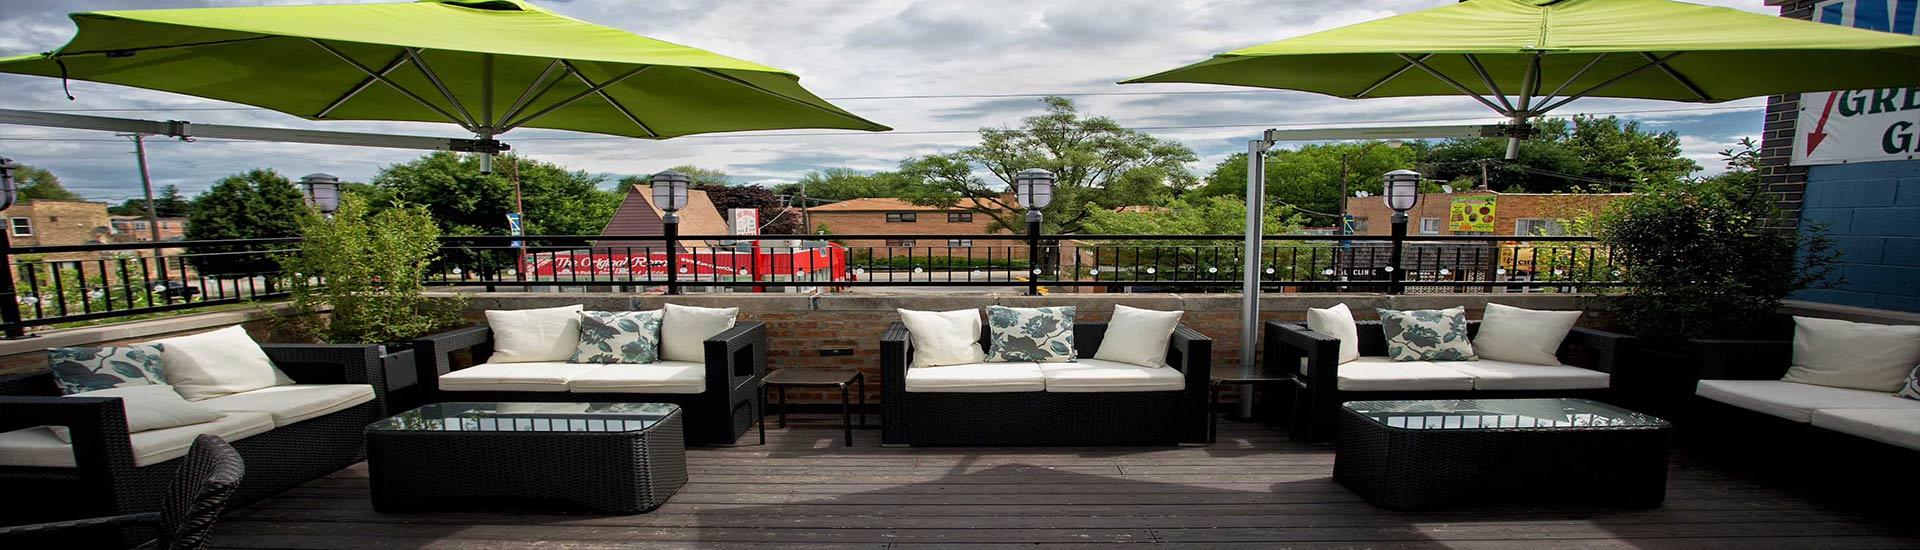 the garage bar rooftop deck